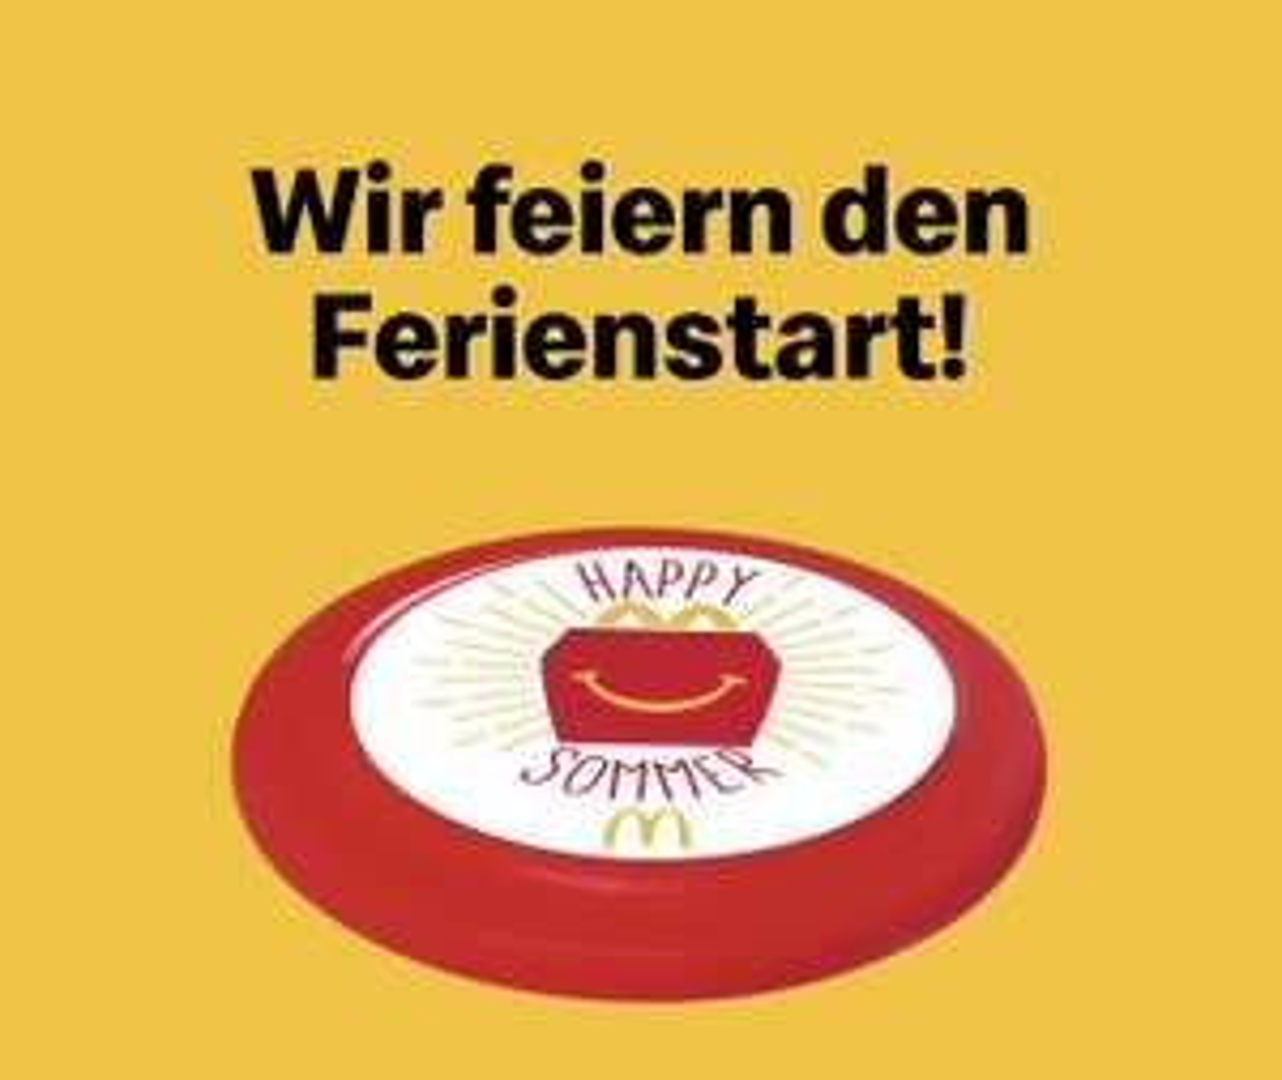 McDonald's: Gratis Frisbee zu jedem Happy Meal Menü am 3./10.7.2021